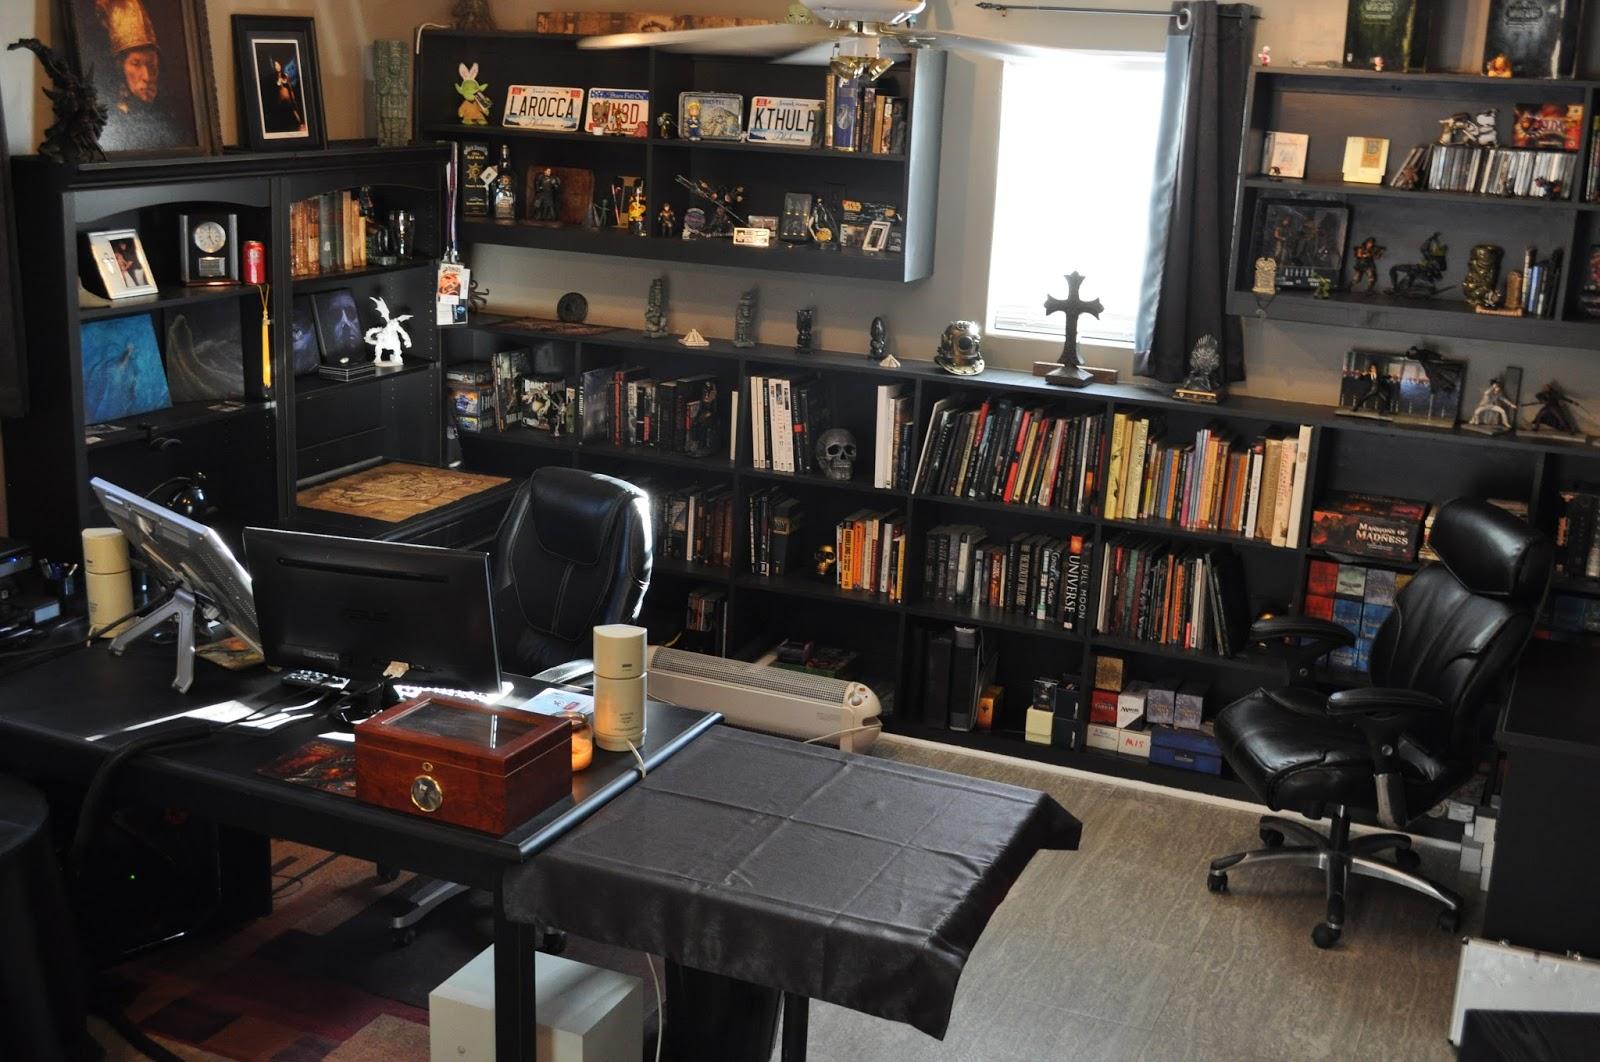 attic conversions plans ideas - Art Studios I Need Your Input